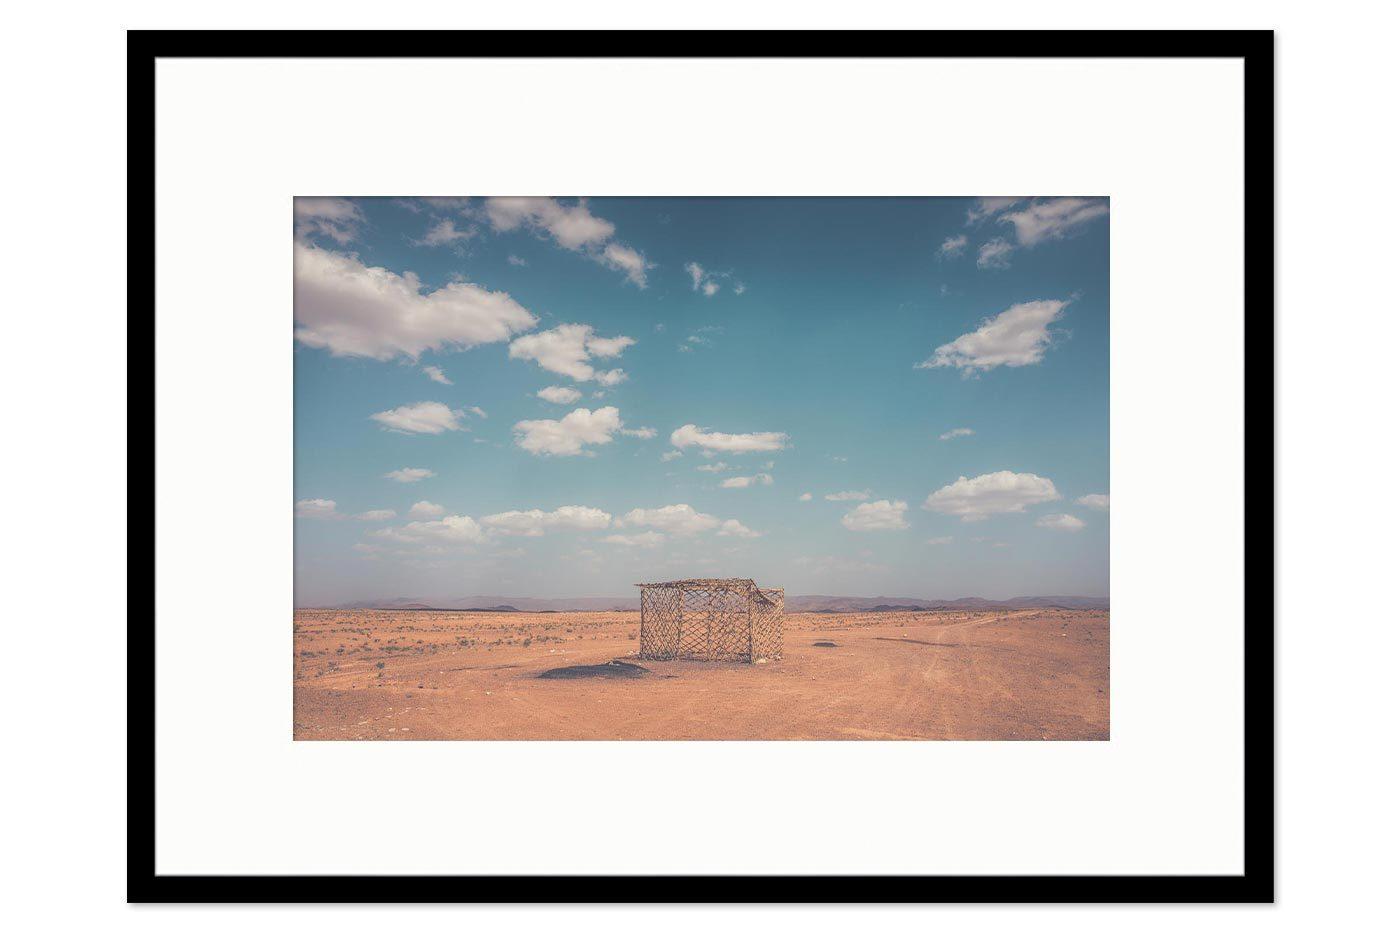 Cadre galerie The Hut